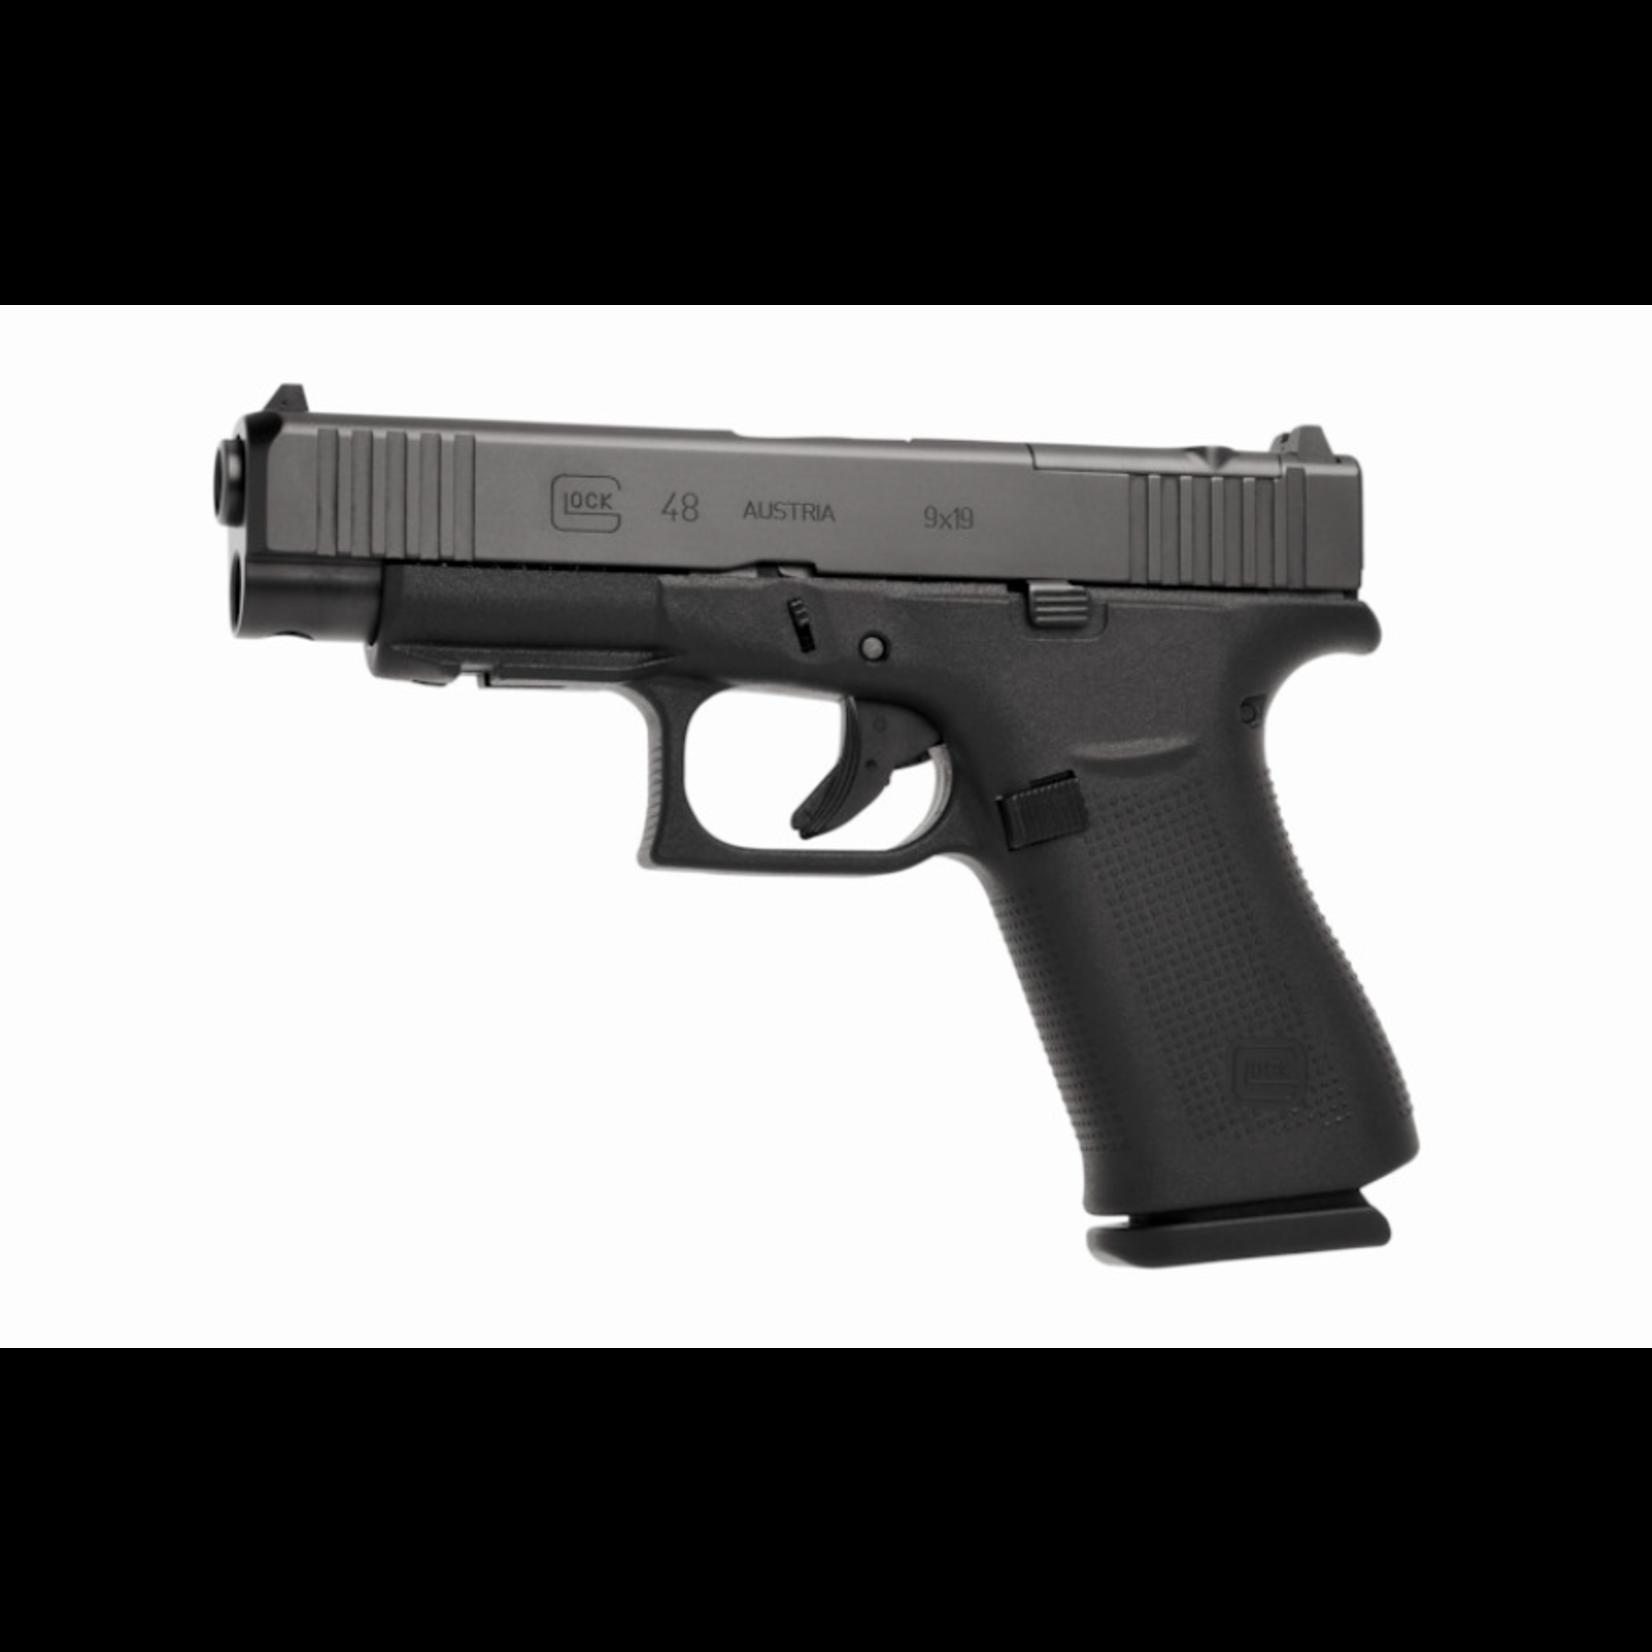 Glock Glock 48 9x19 Slim Line MOS